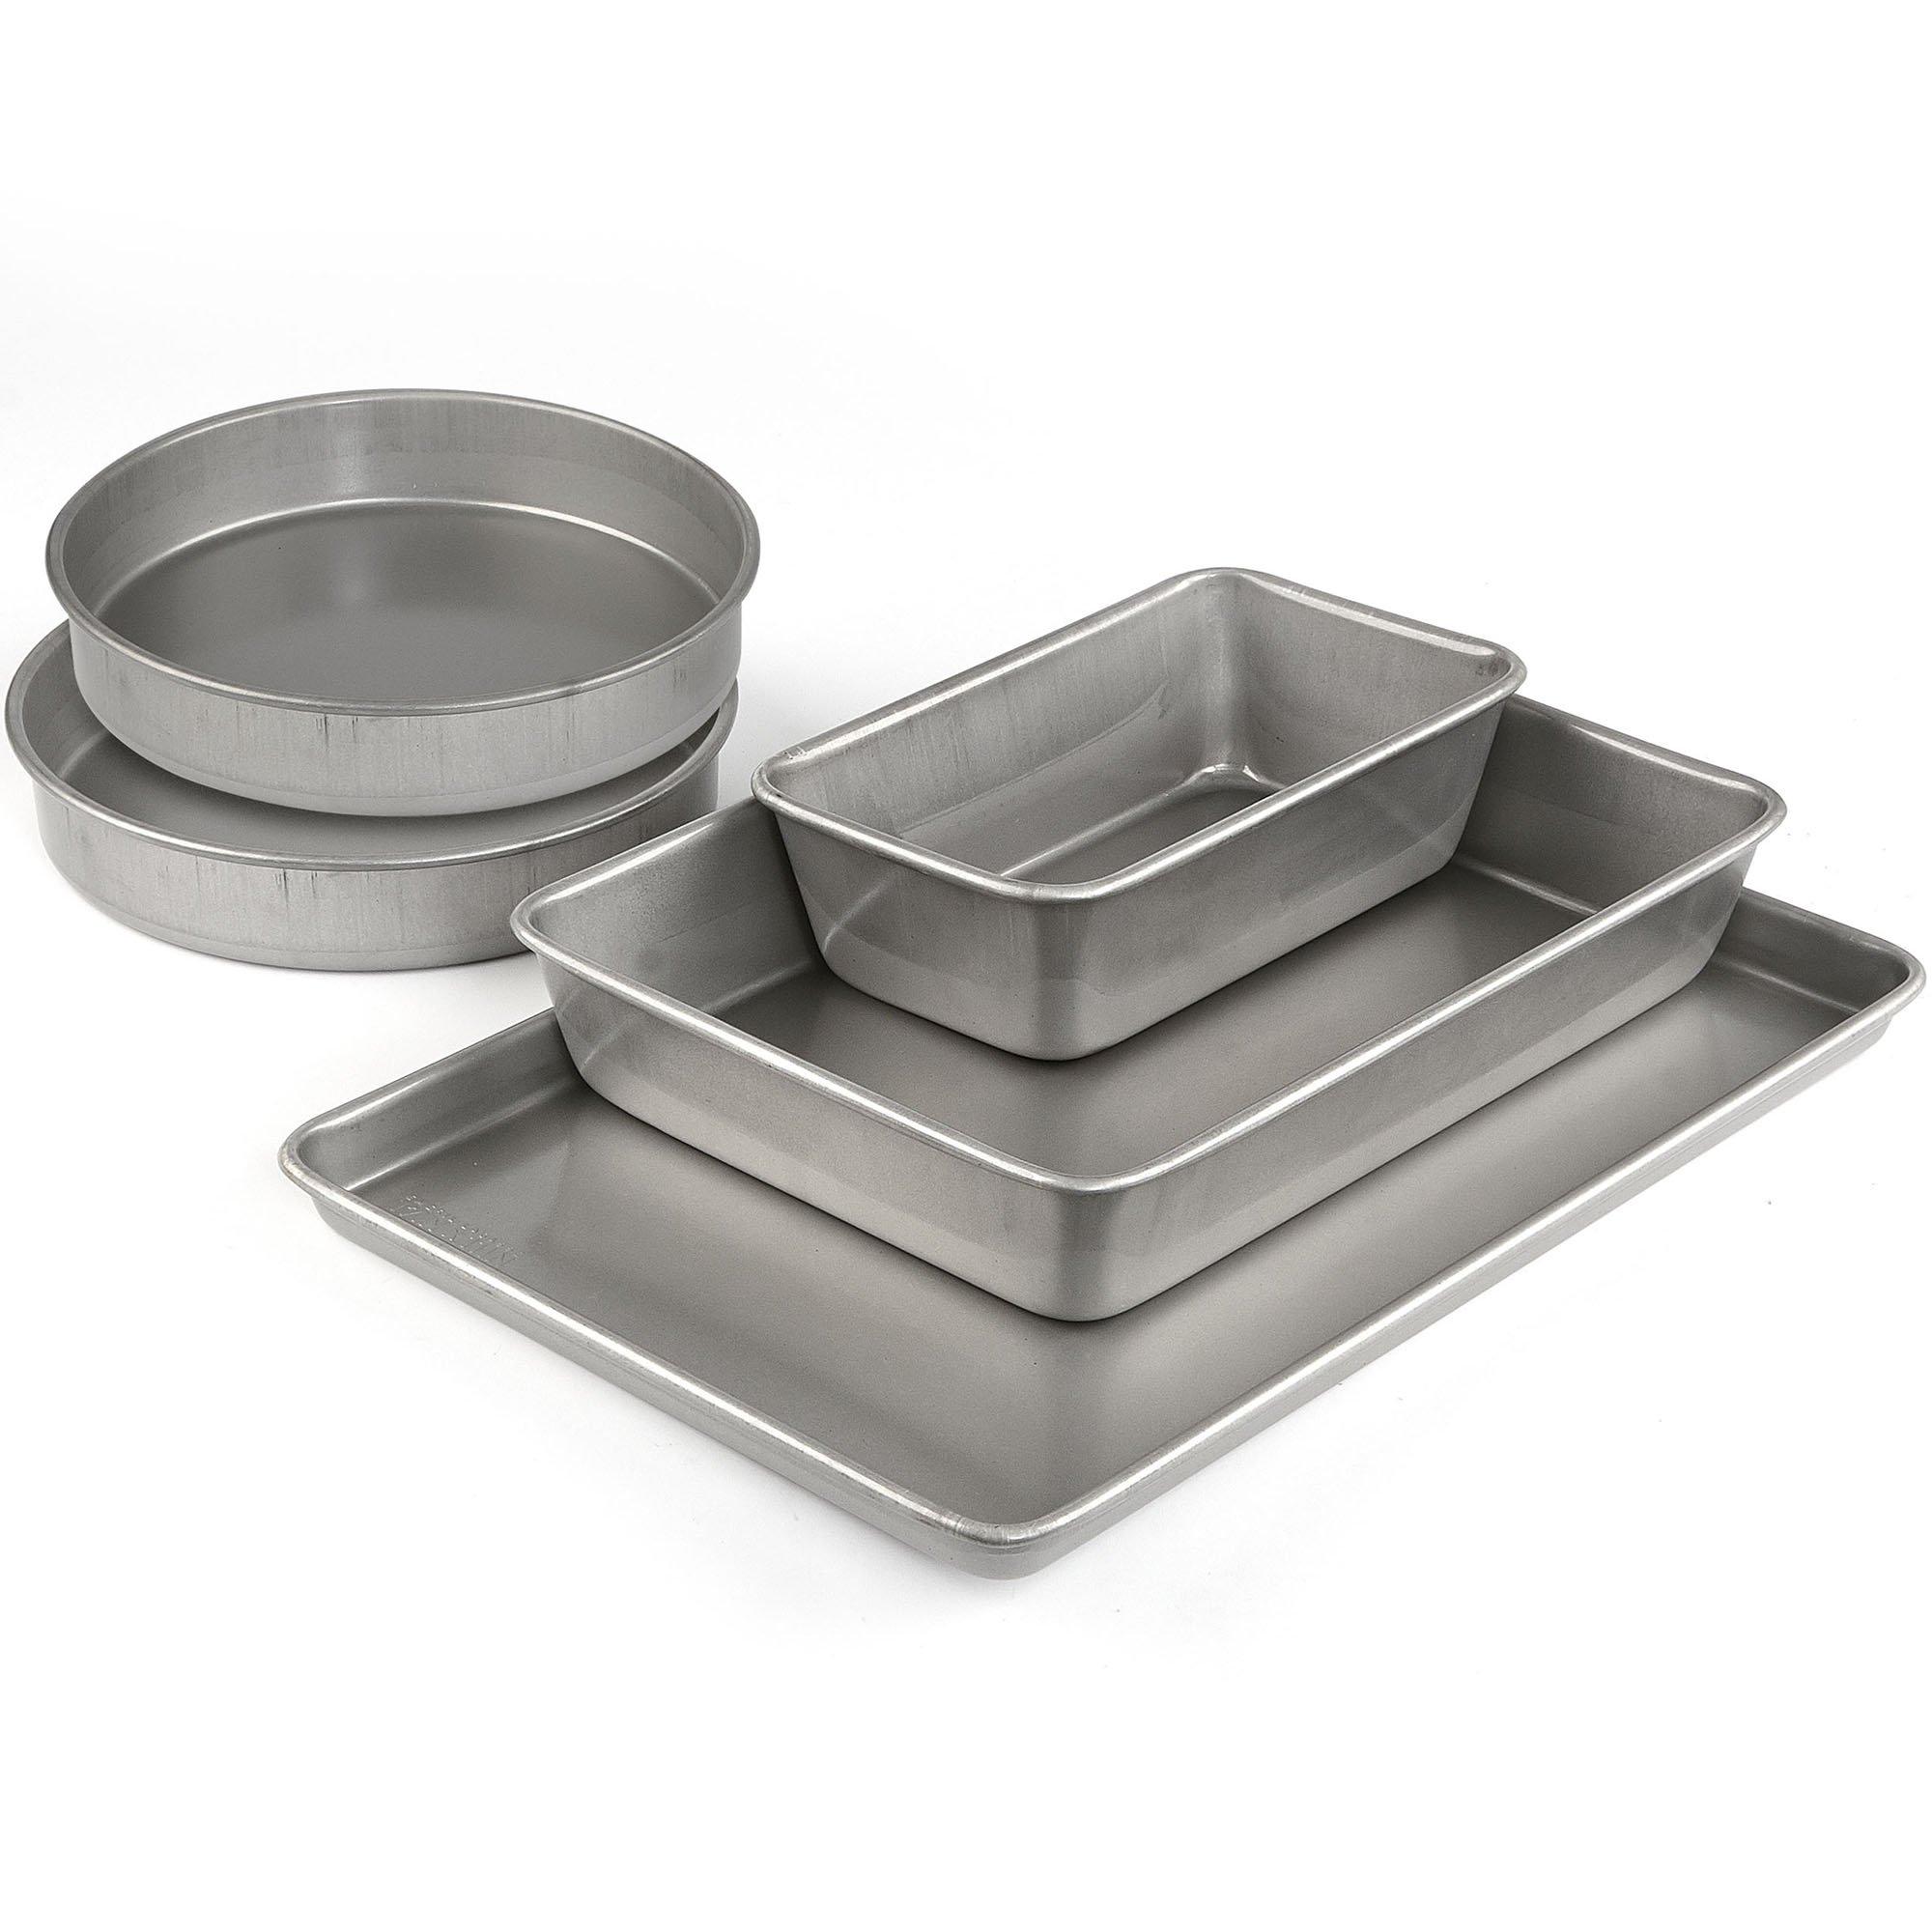 Emeril Lagasse 62670 Aluminized Steel Nonstick 5-Piece Bakeware Set